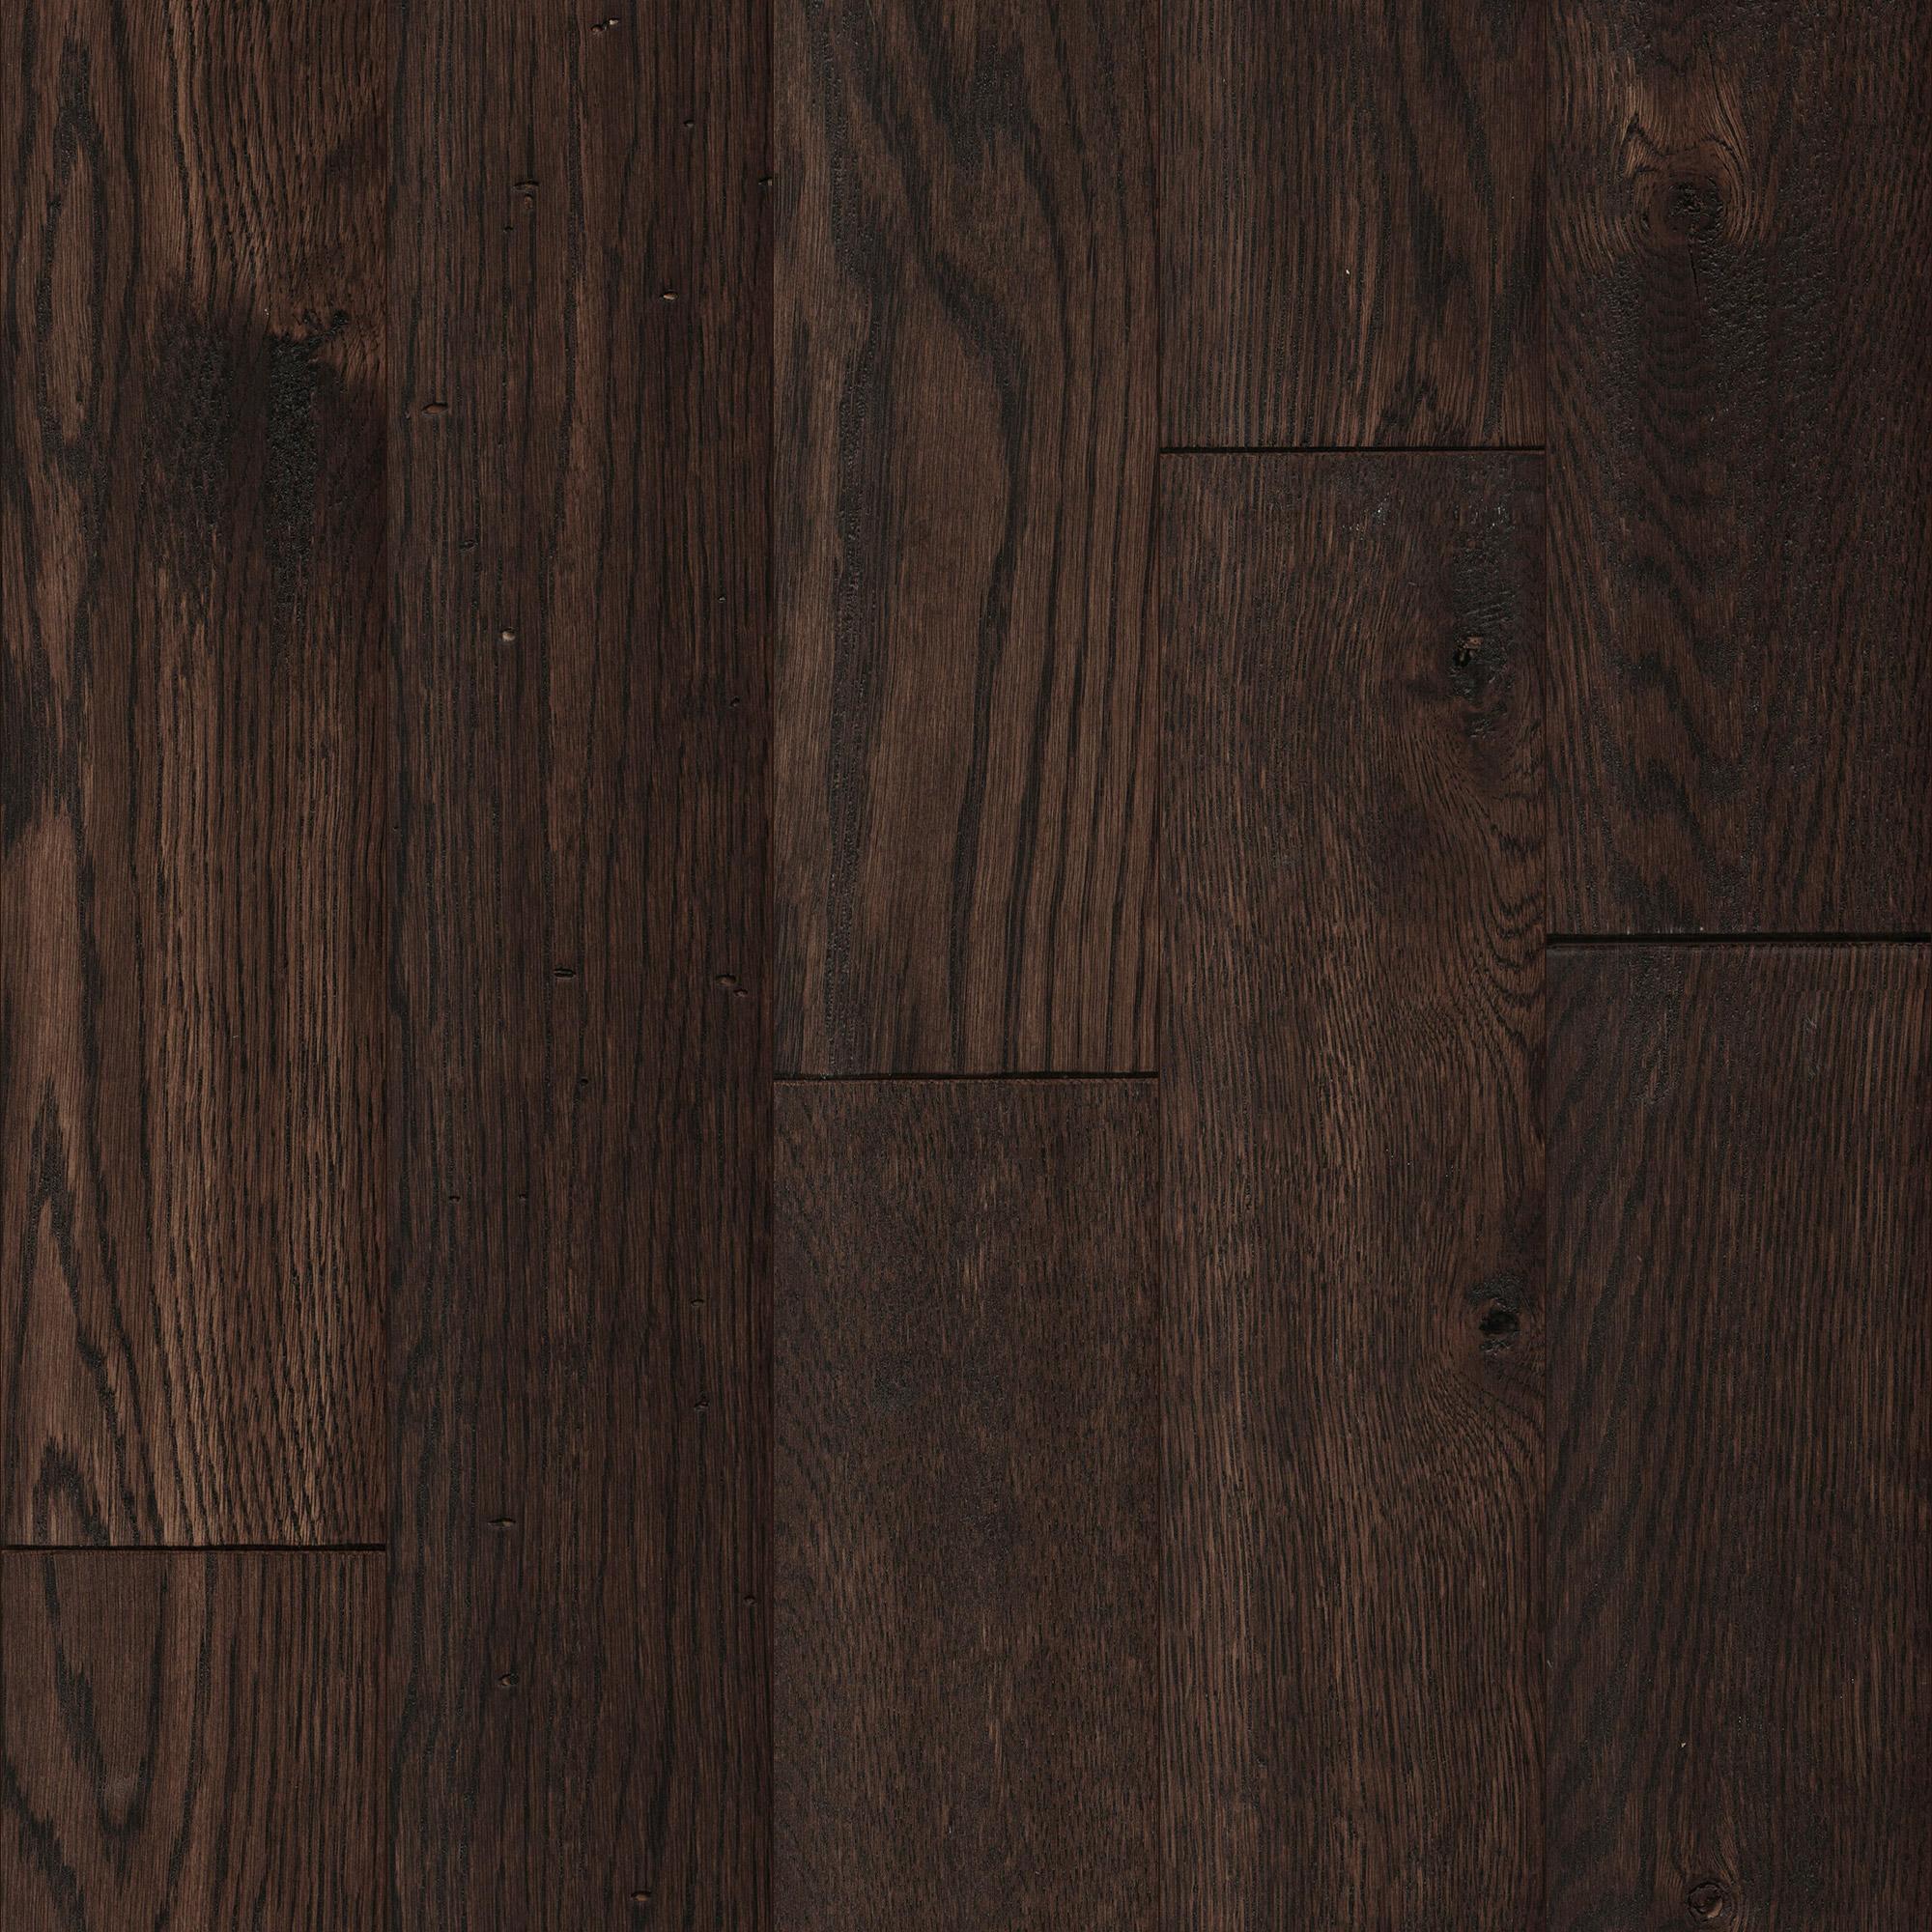 columbia hardwood flooring distributors of mullican chatelaine oak ebony 4 wide solid hardwood flooring within more views